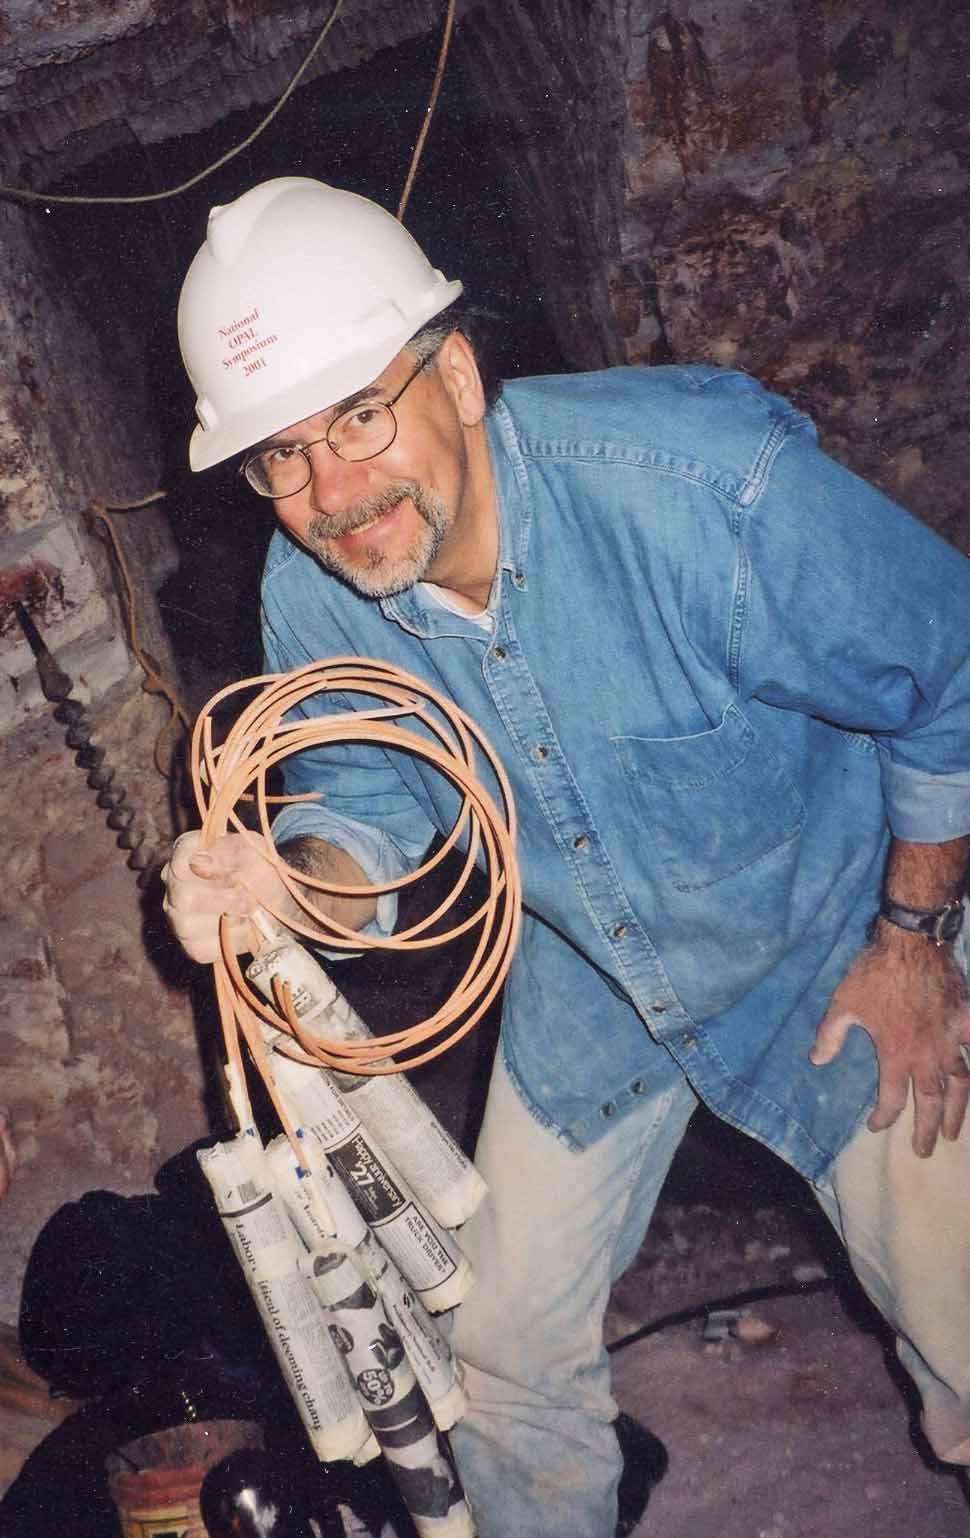 Steve W. Bombs